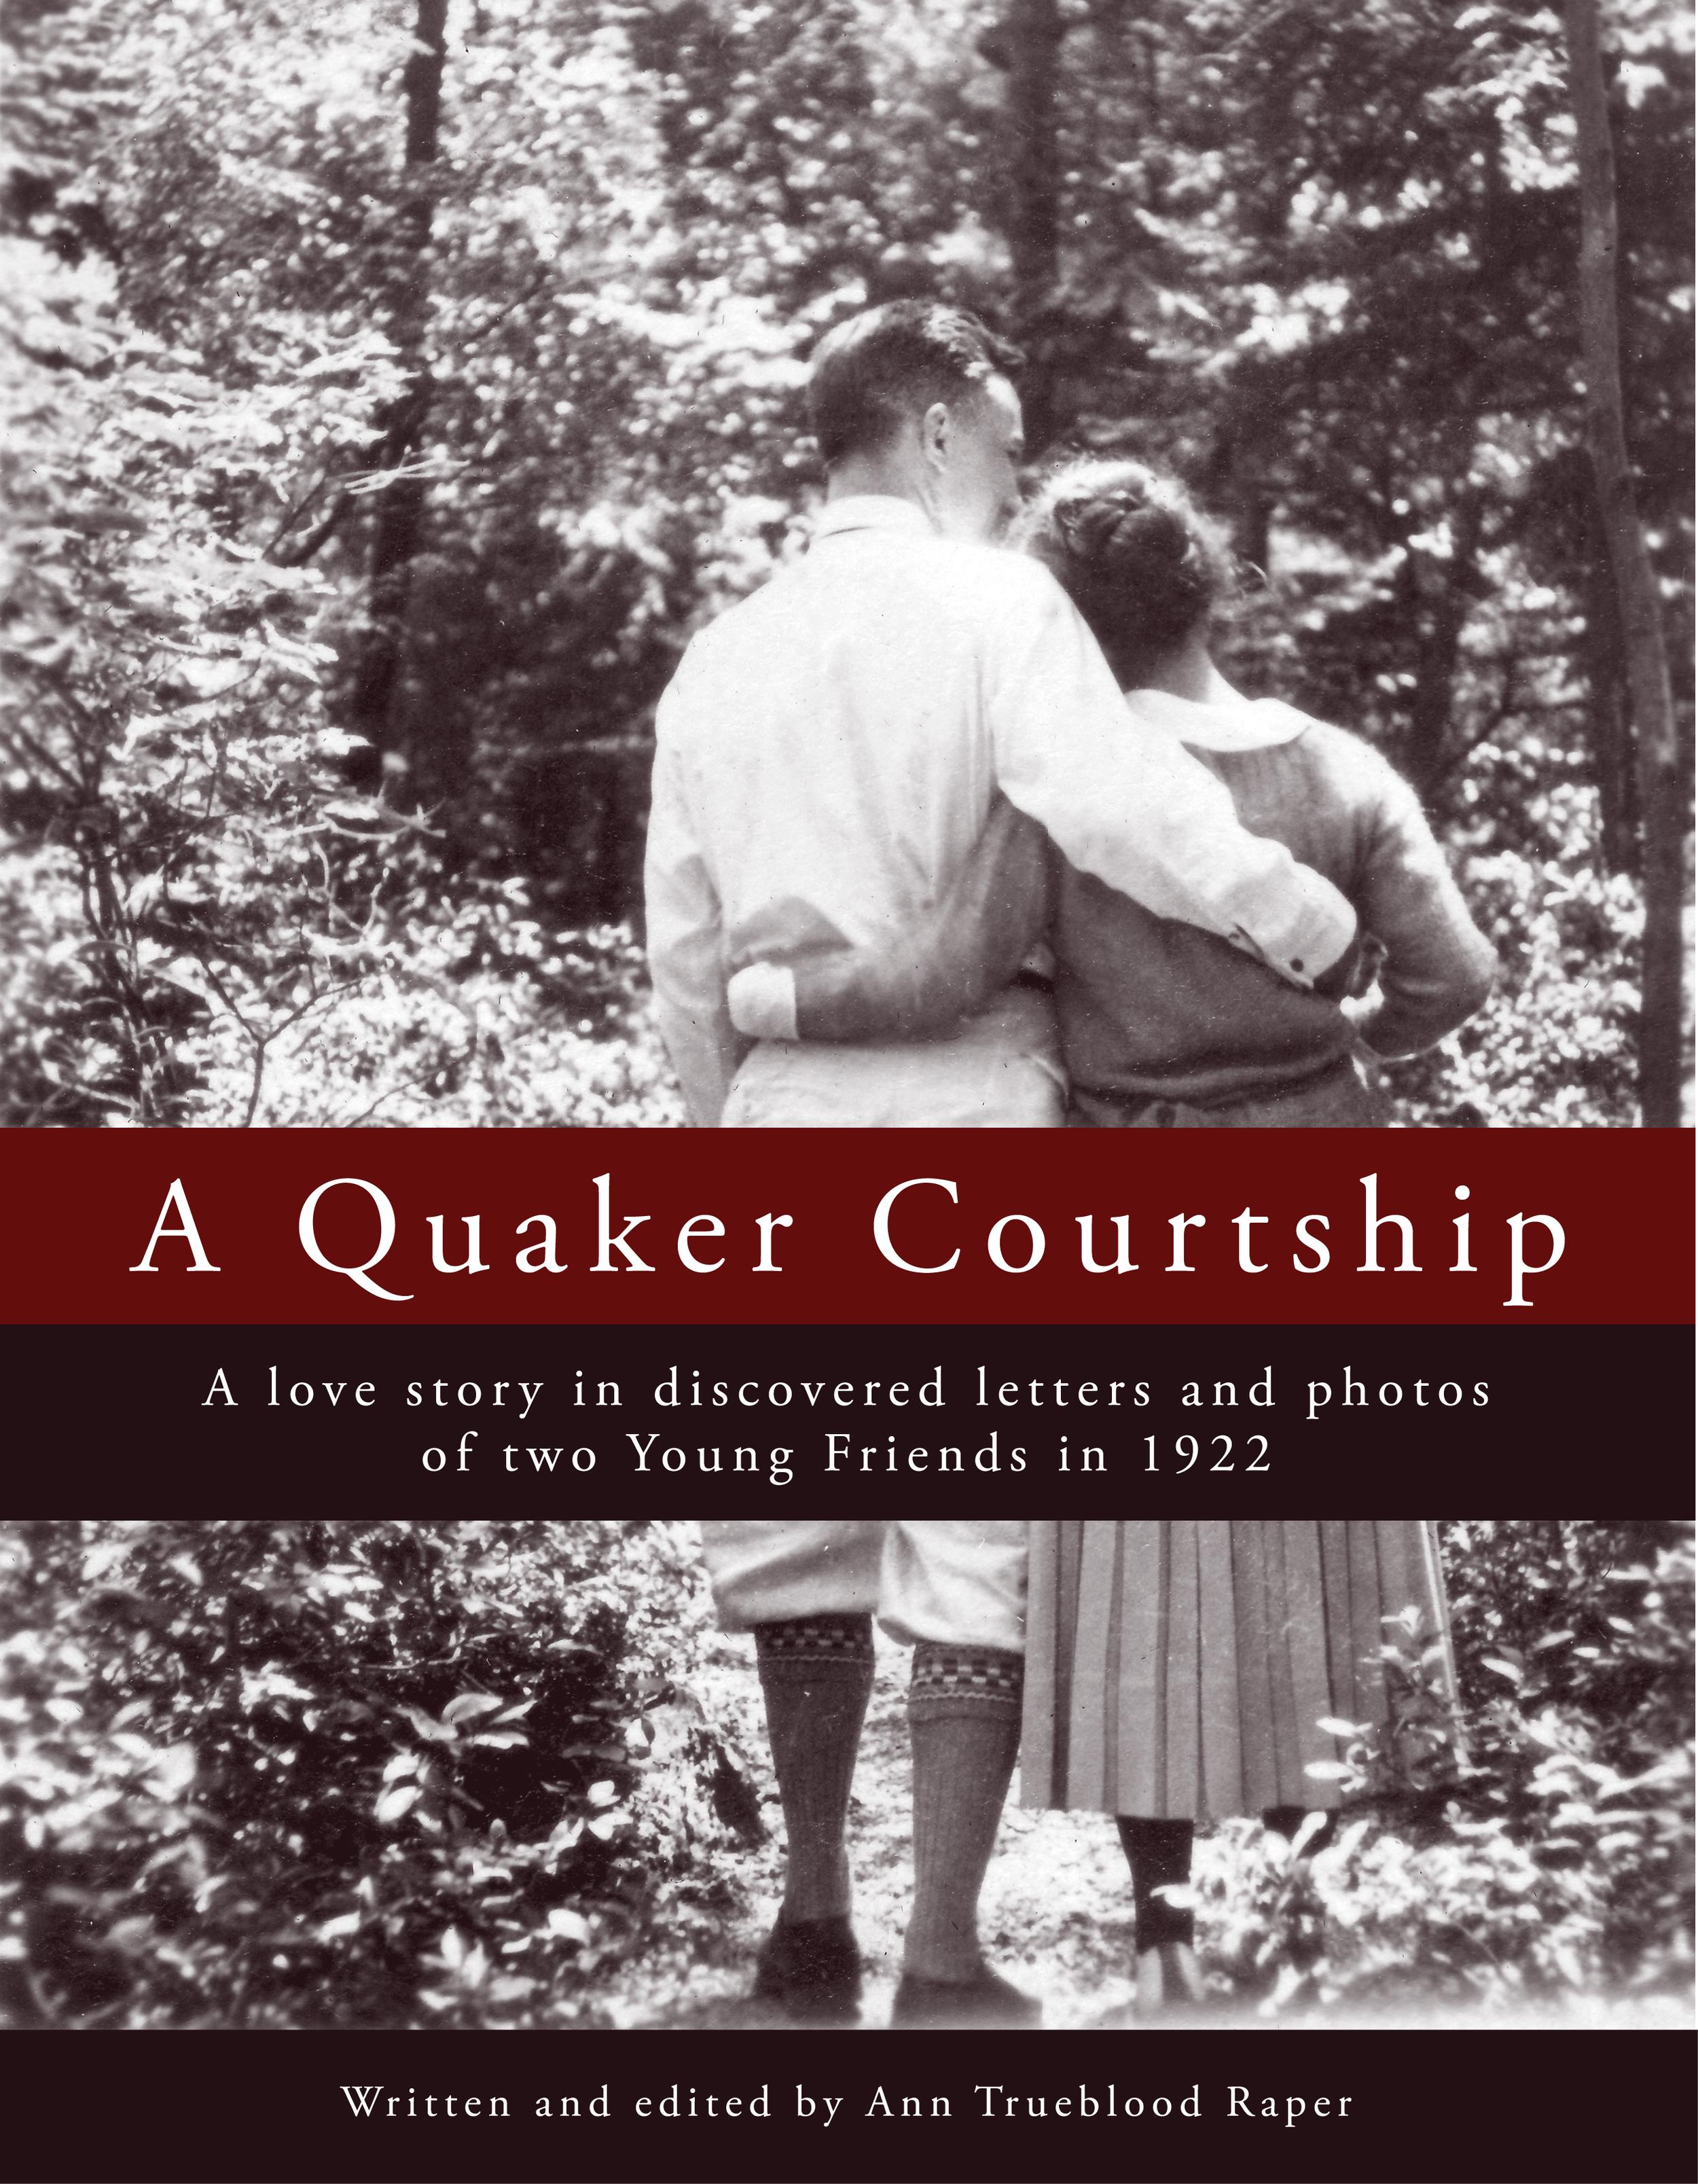 A Quaker Courtship